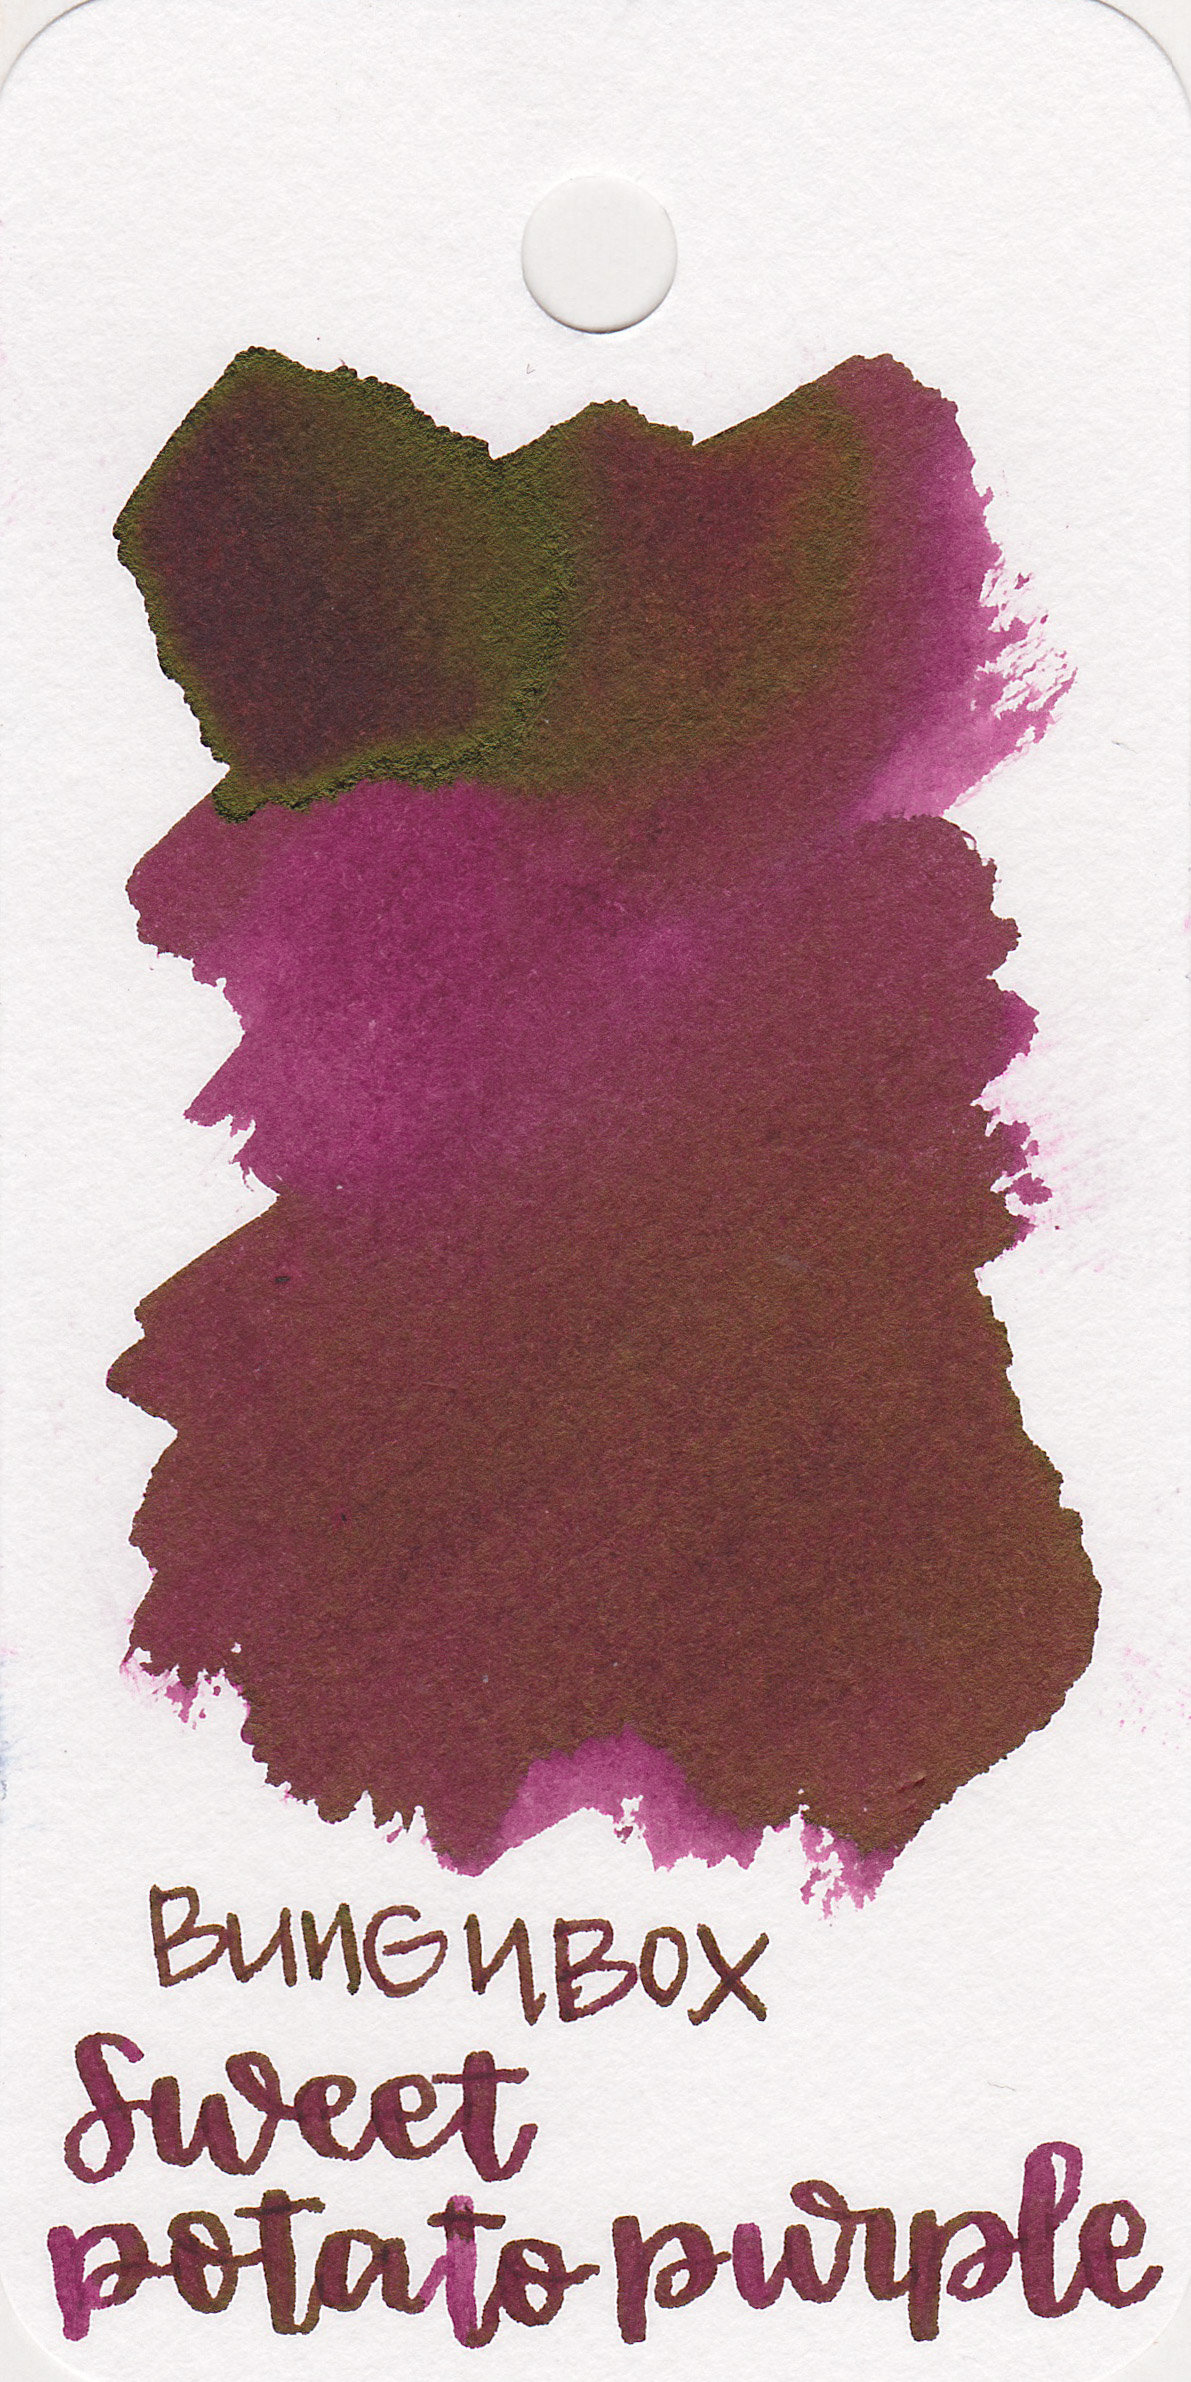 bb-sweet-potato-purple-1.jpg